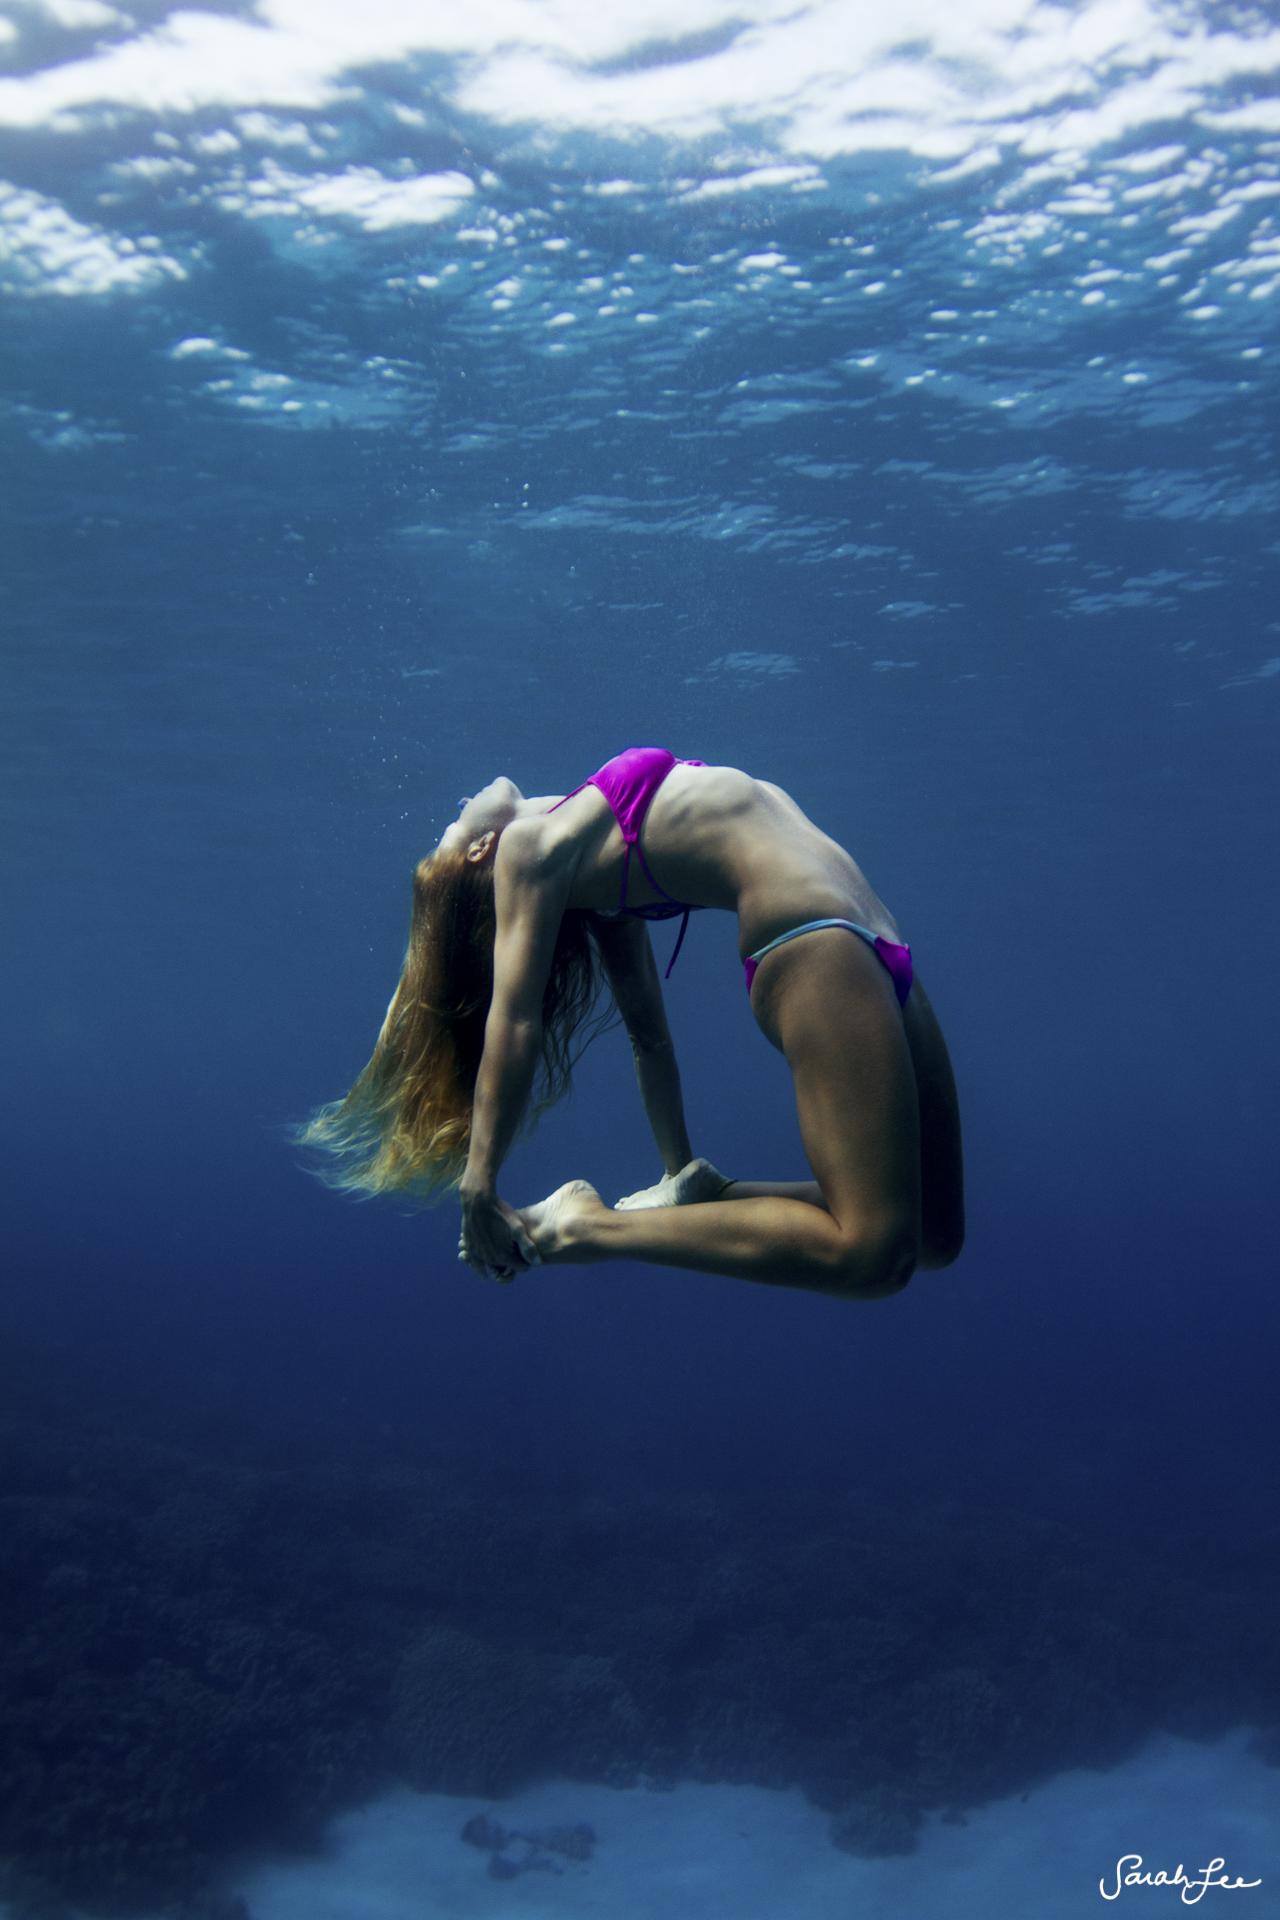 017_Sarah_Lee_Photography_Underwater_.jpg